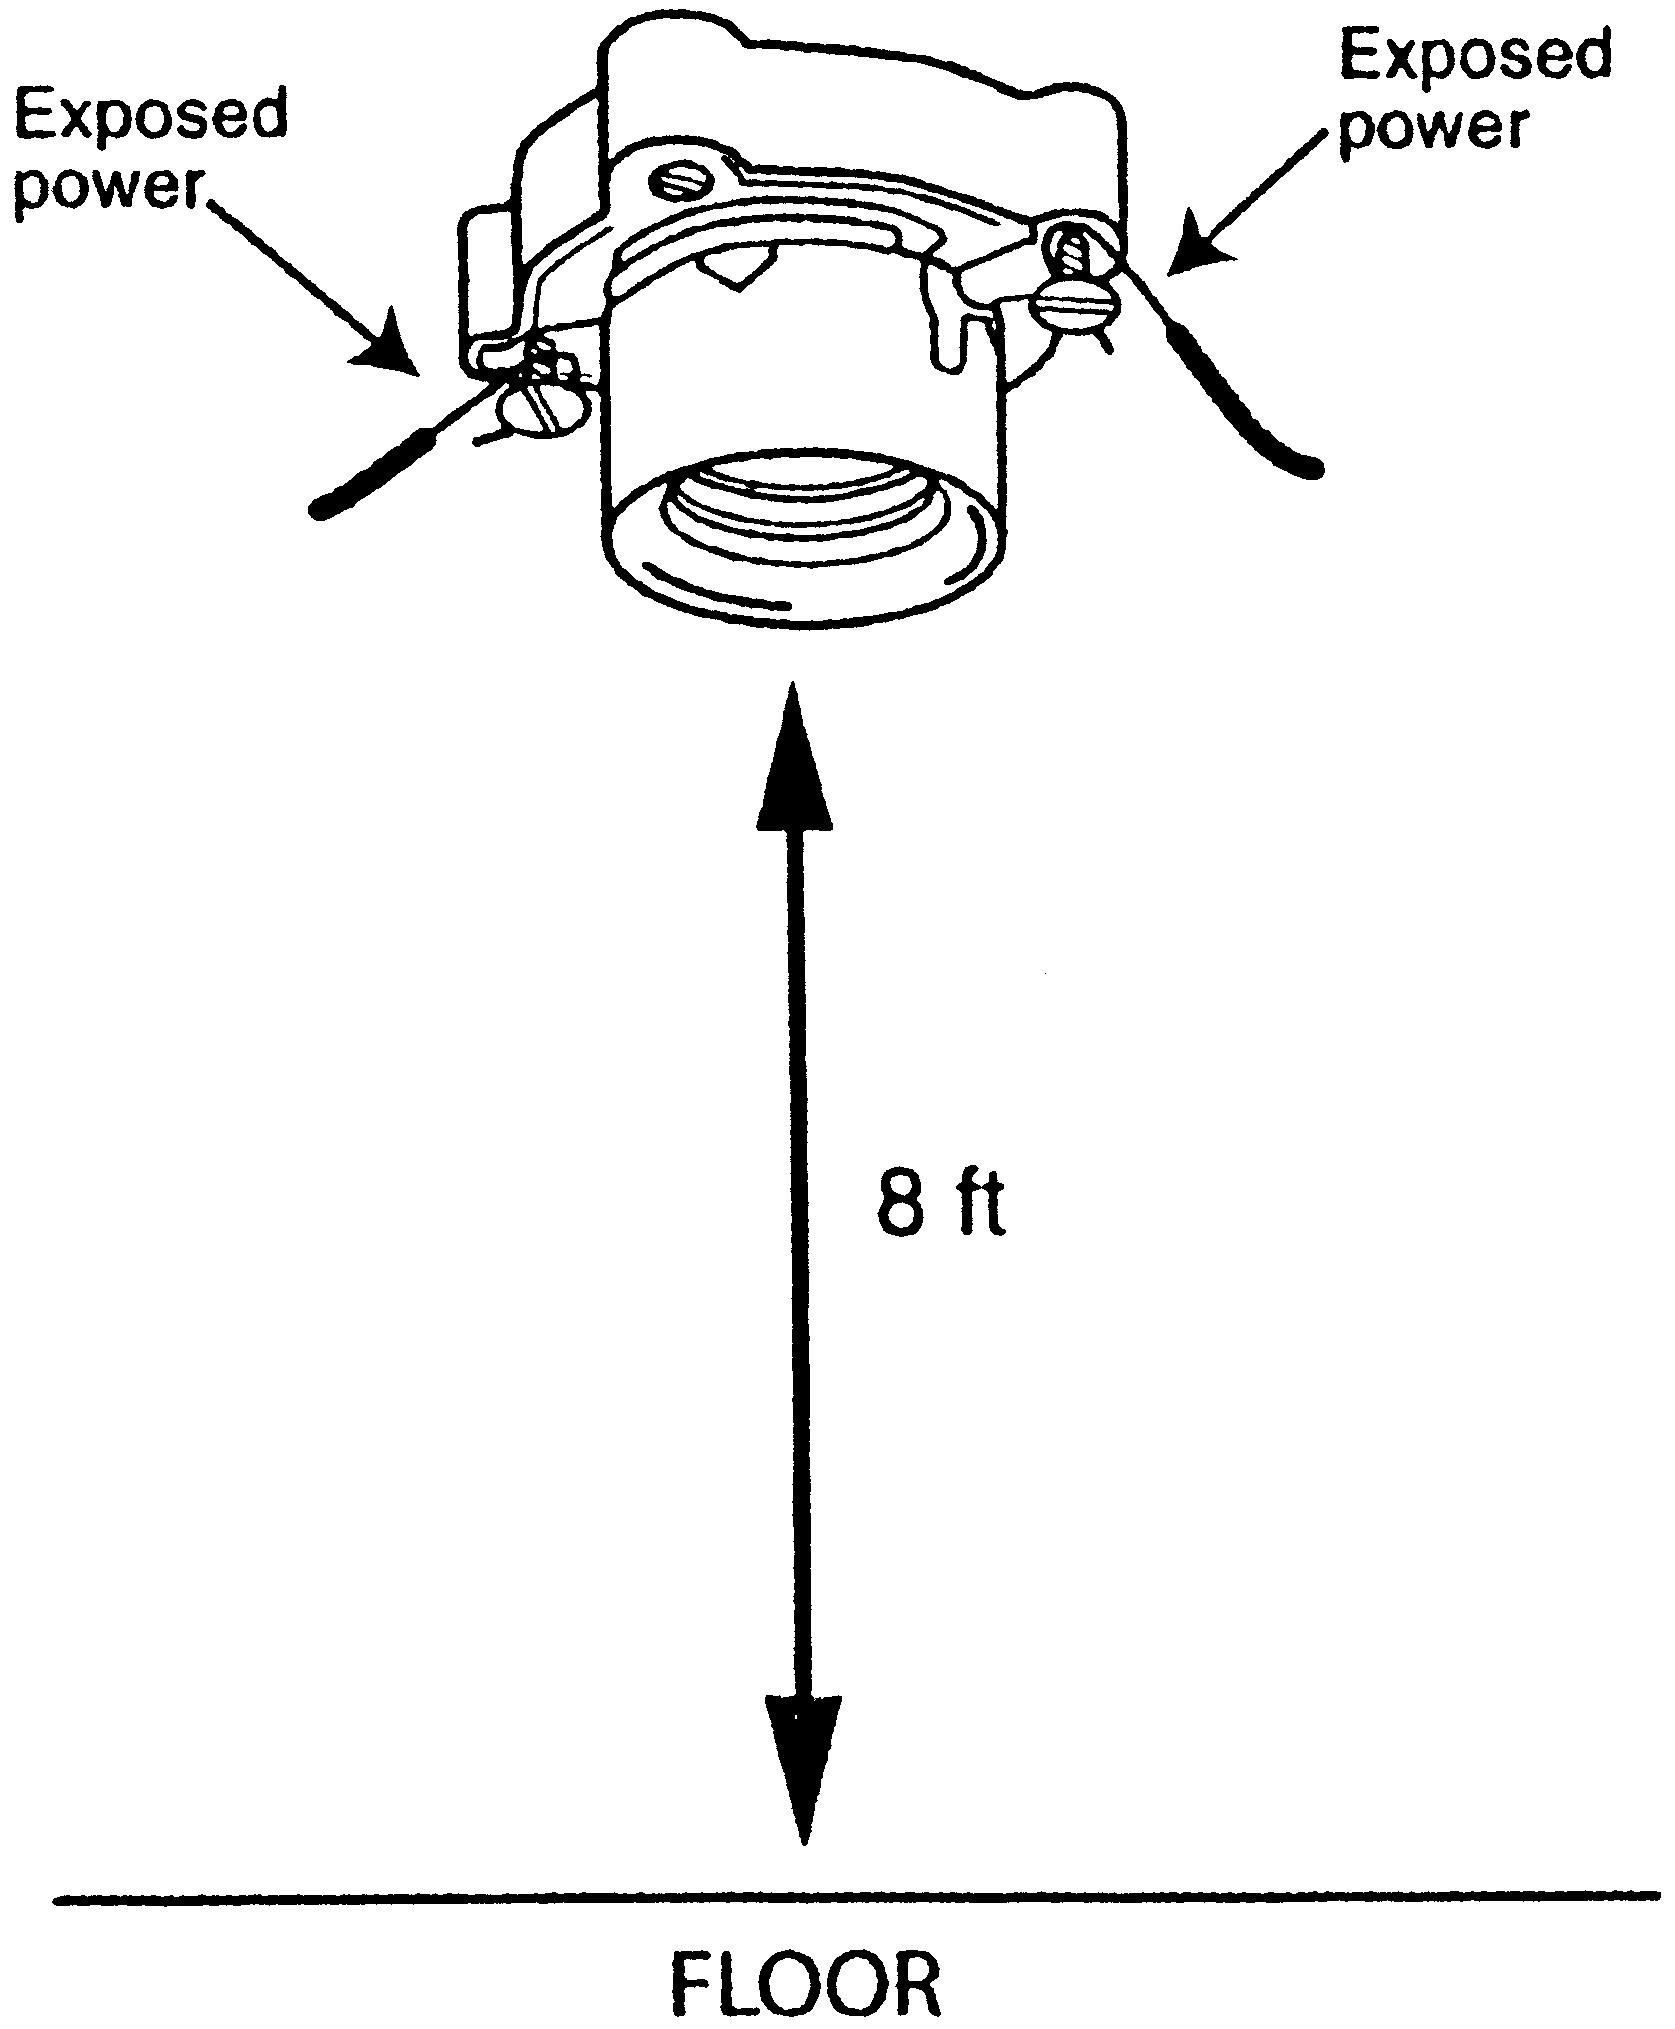 7400 ic wiring diagram database 3 Input Nand Gate 7400 ic wiring diagram database nor gate 7400 ic